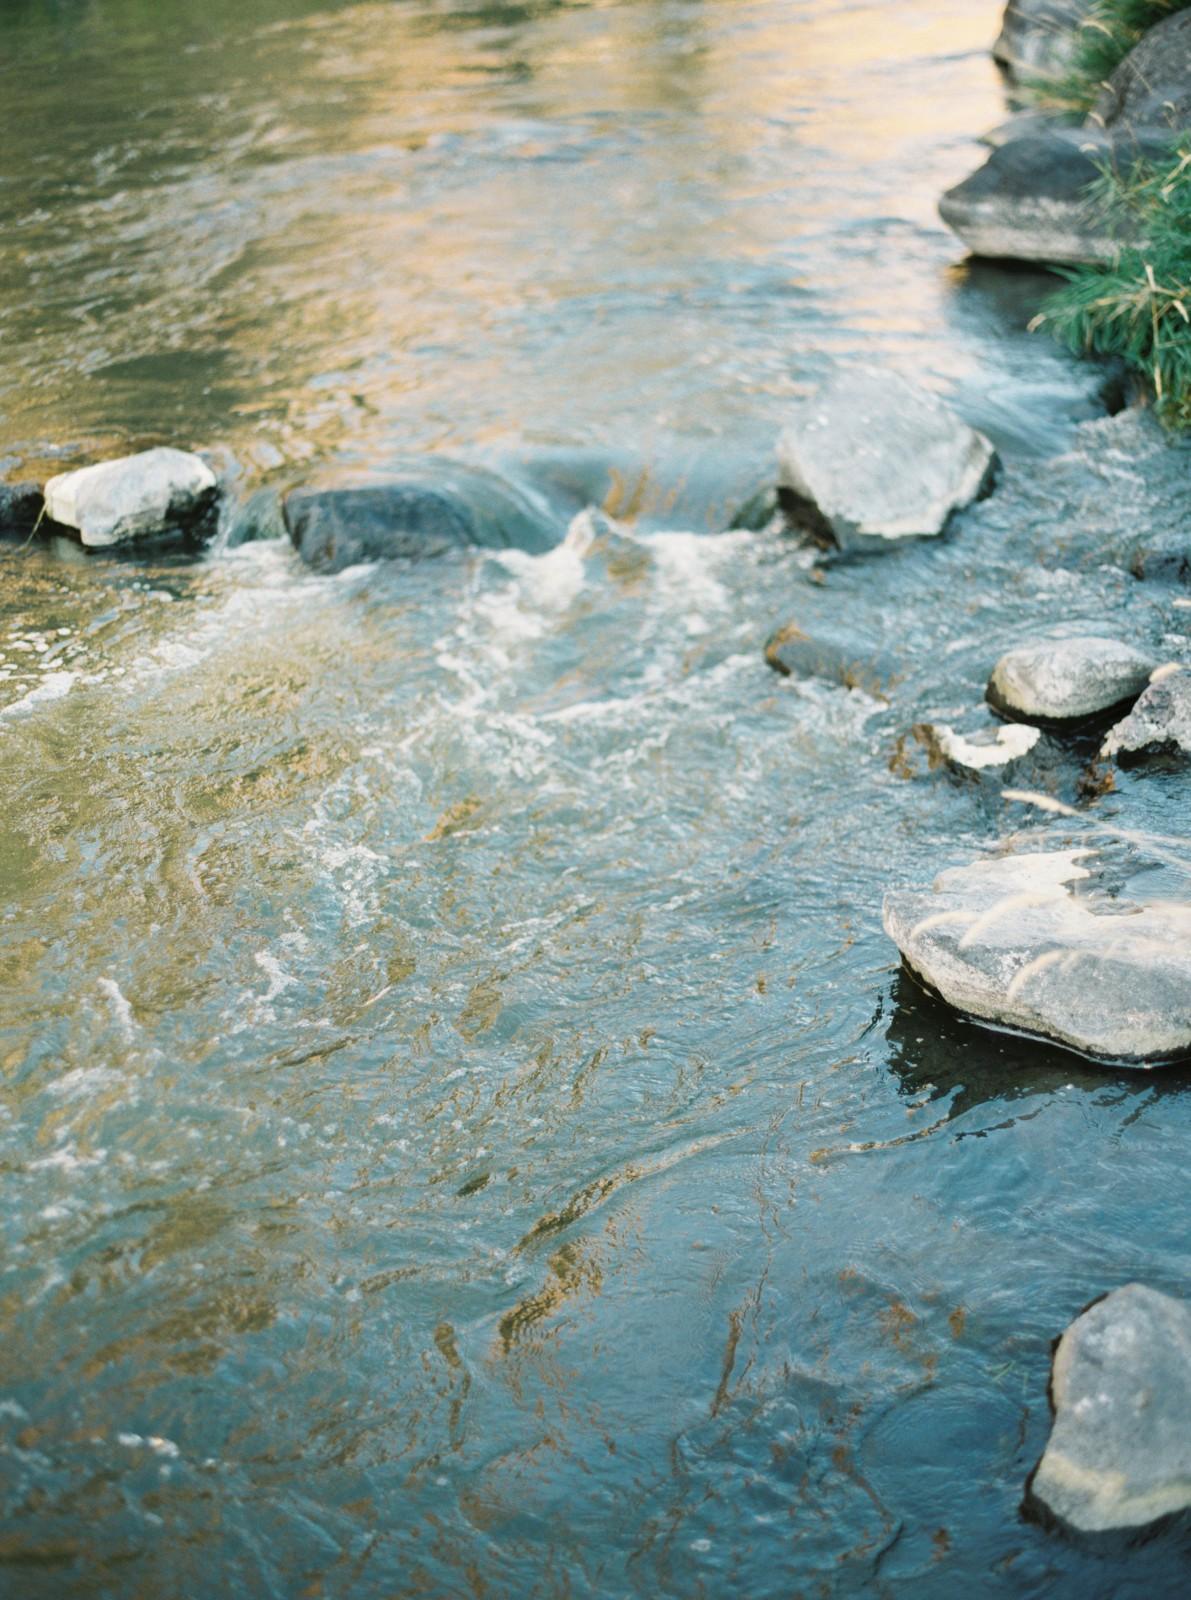 0026-ErichMcVeyWorkshop|Bend2014|Water